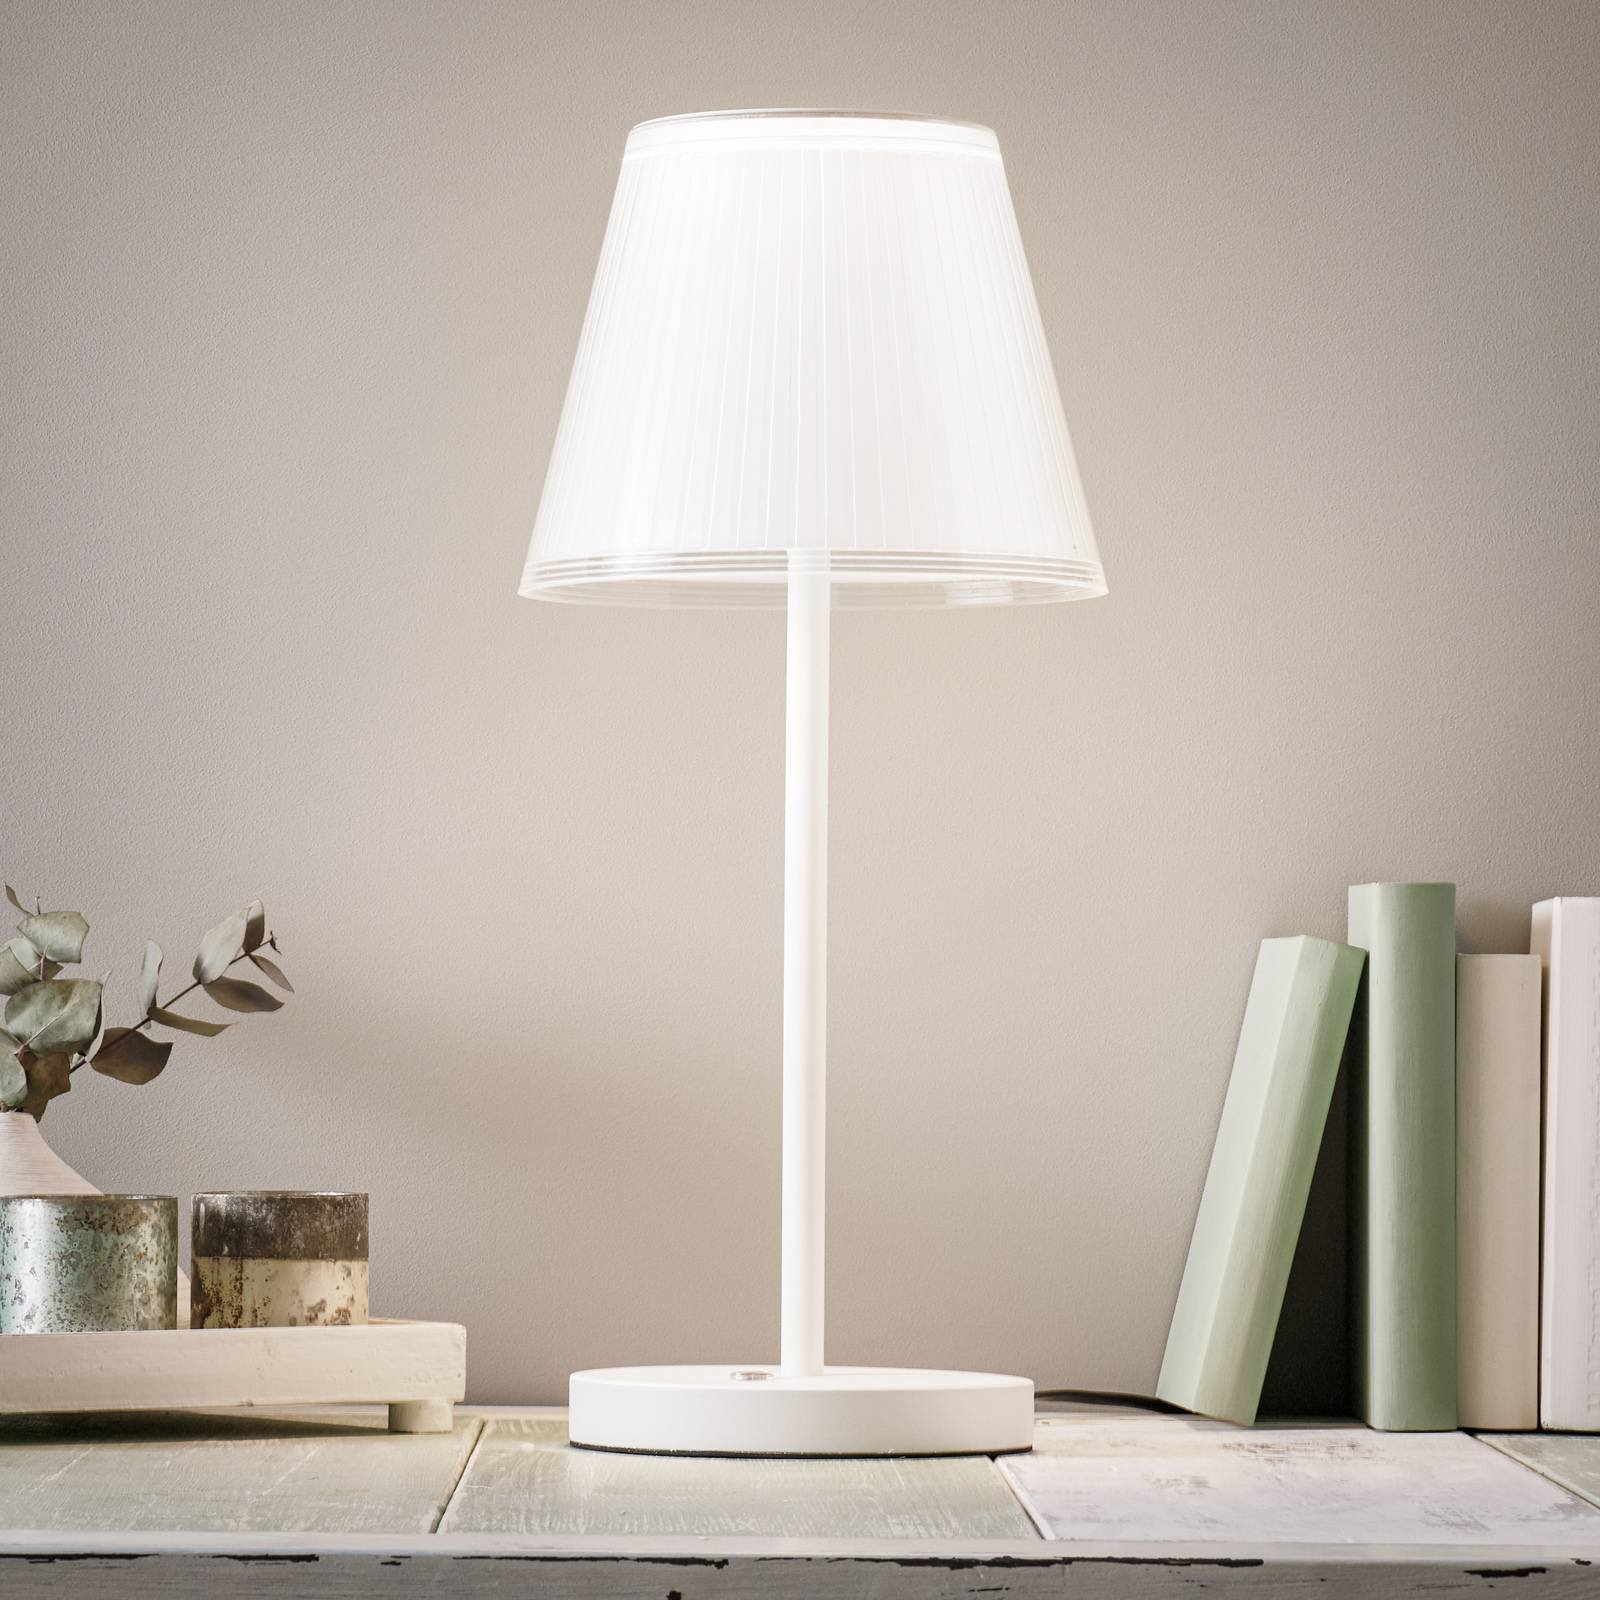 LED-bordlampe Alema, dimbar, vippbar skjerm